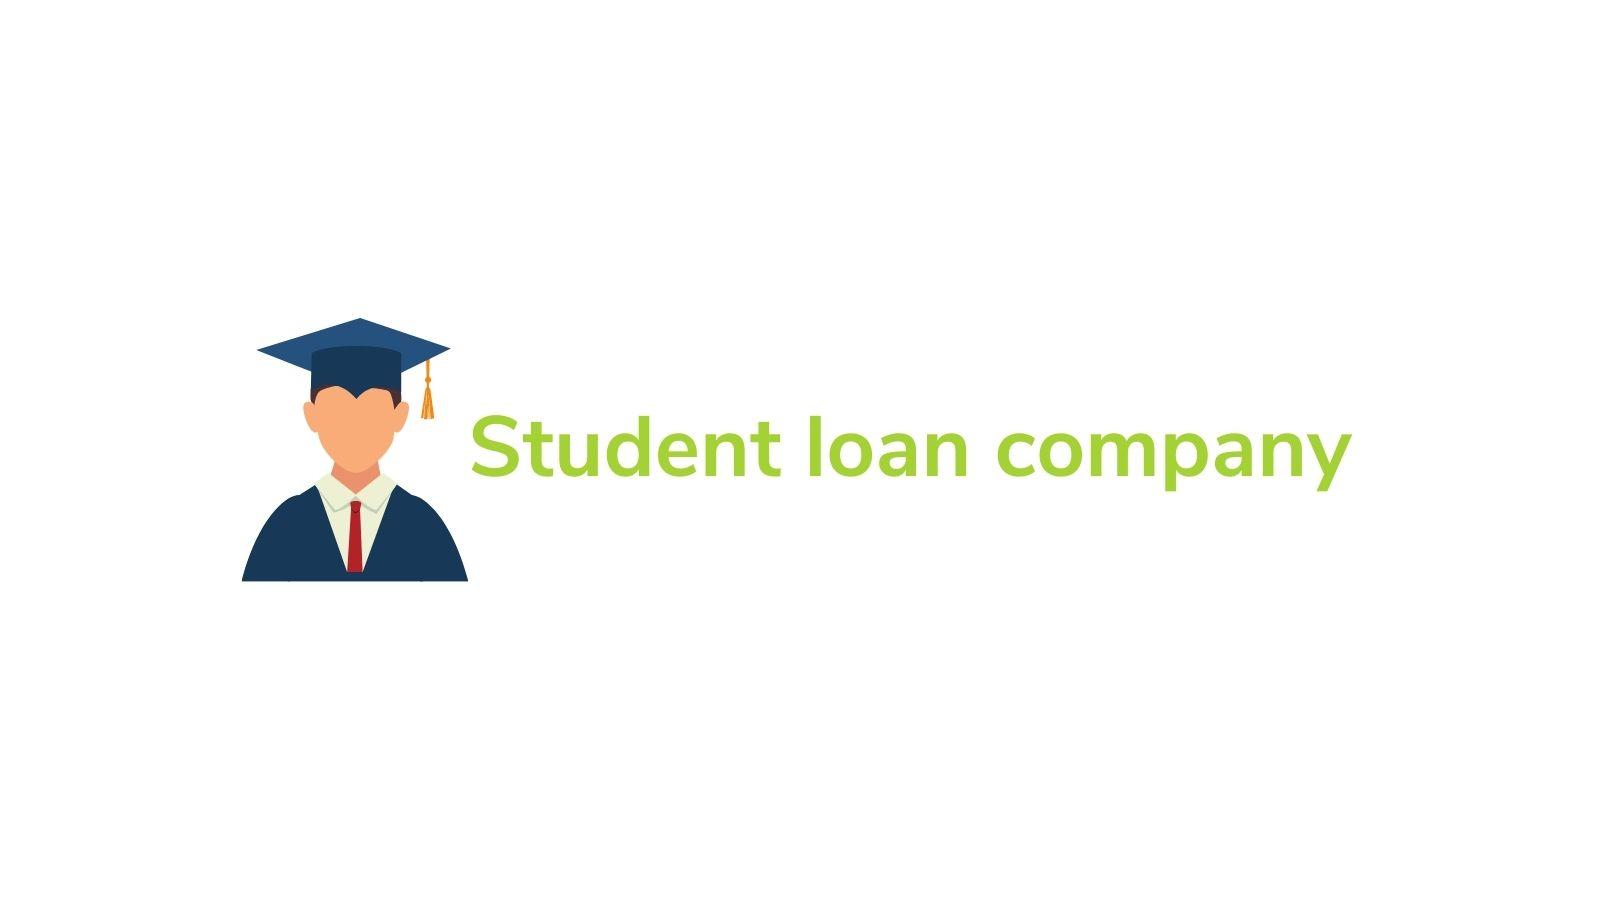 Student loan company image (1)